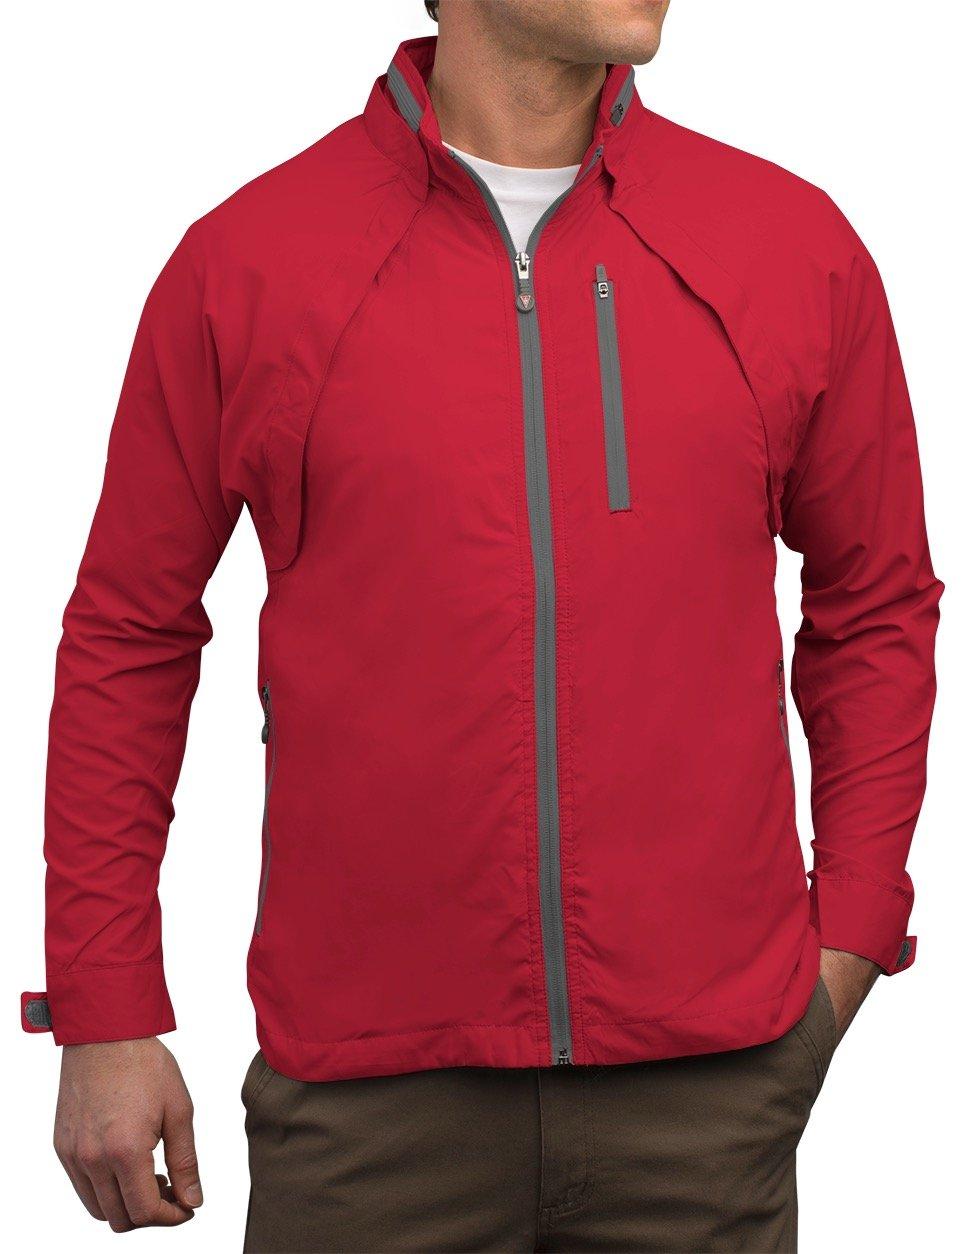 SCOTTeVEST Tropiformer Jacket - 22 Pockets – Convertible, Travel Clothing RED L by SCOTTeVEST